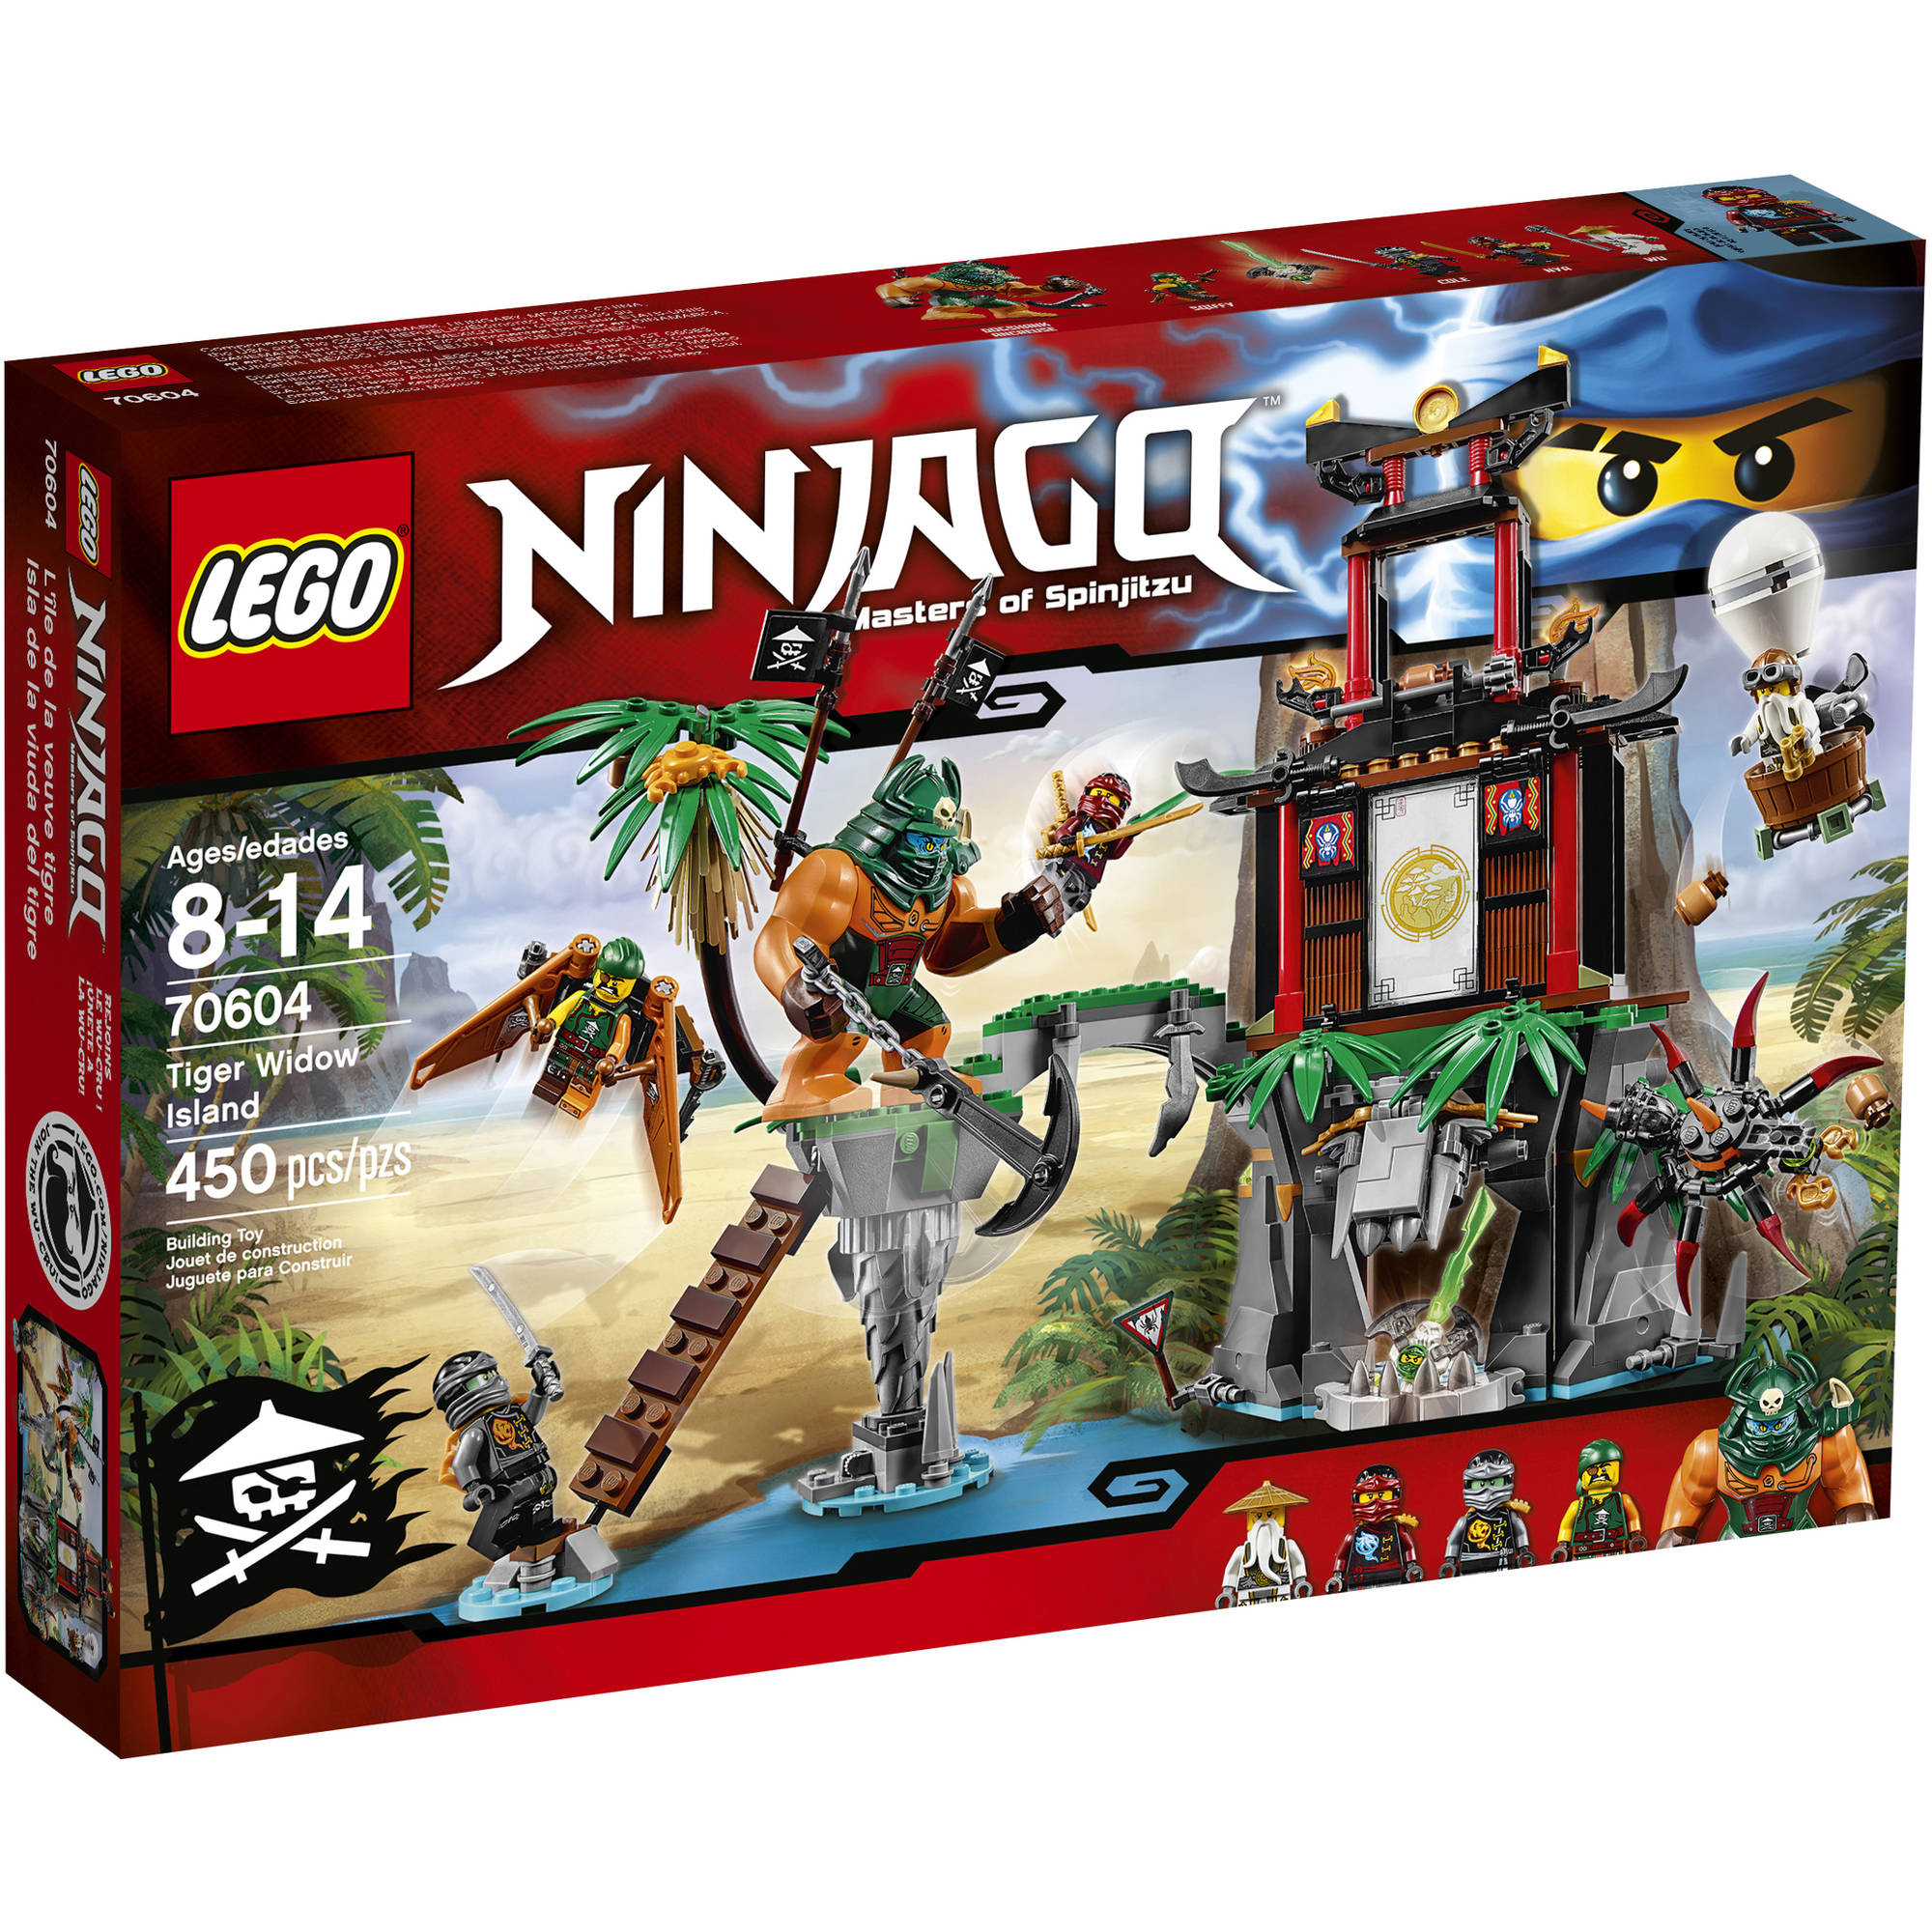 Lego Toys At Walmart : Lego ninjago garmadon s dark fortress set walmart